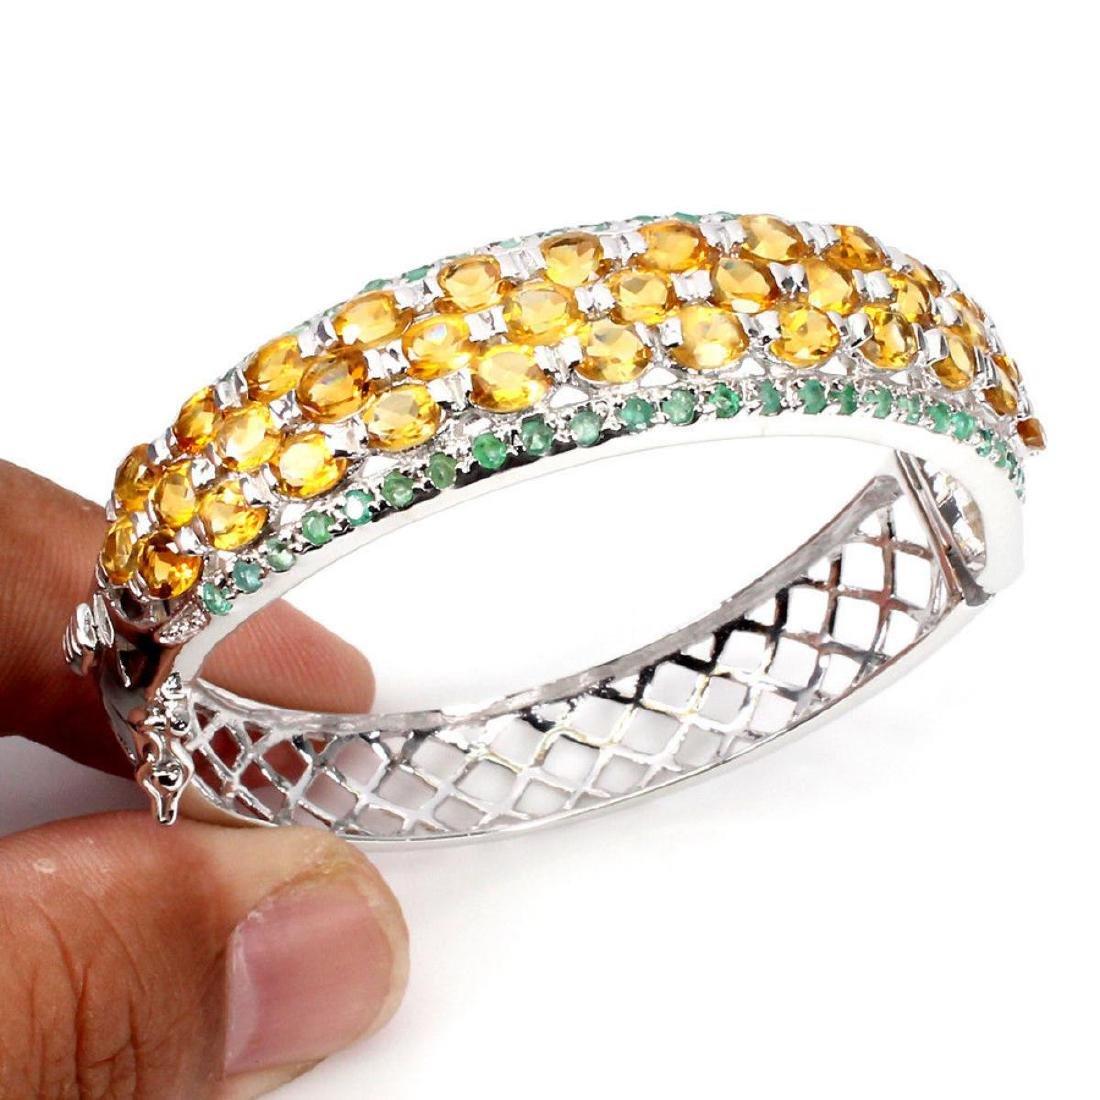 Natural Top Rich Yellow Citrine & Emerald Bangle - 2